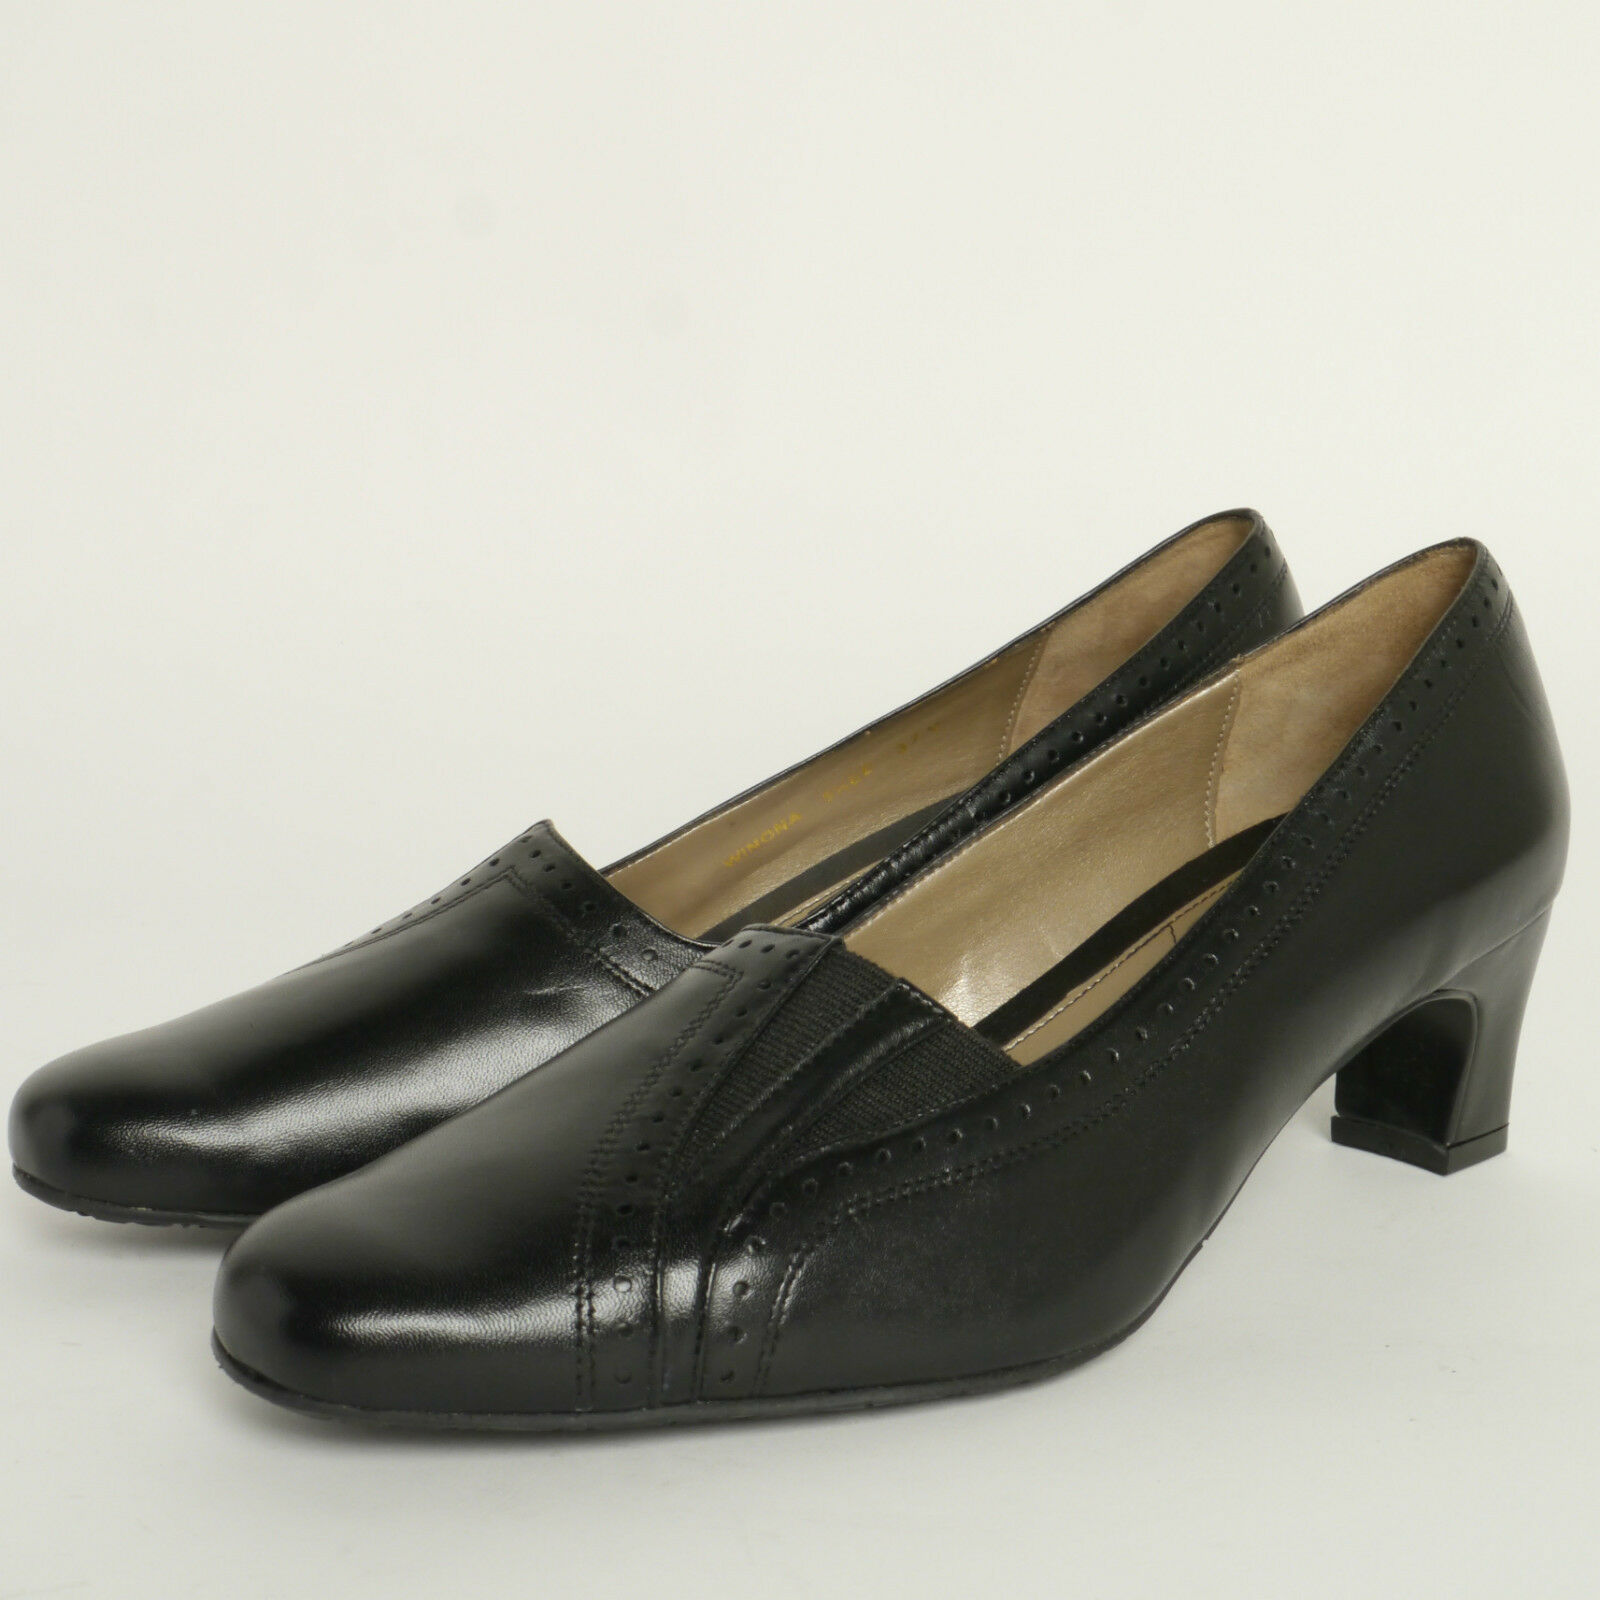 VAN DAL LADIES HEEL EE COURT Schuhe WINONA IN BLACK LEATHER EE HEEL FITTING 421fa0